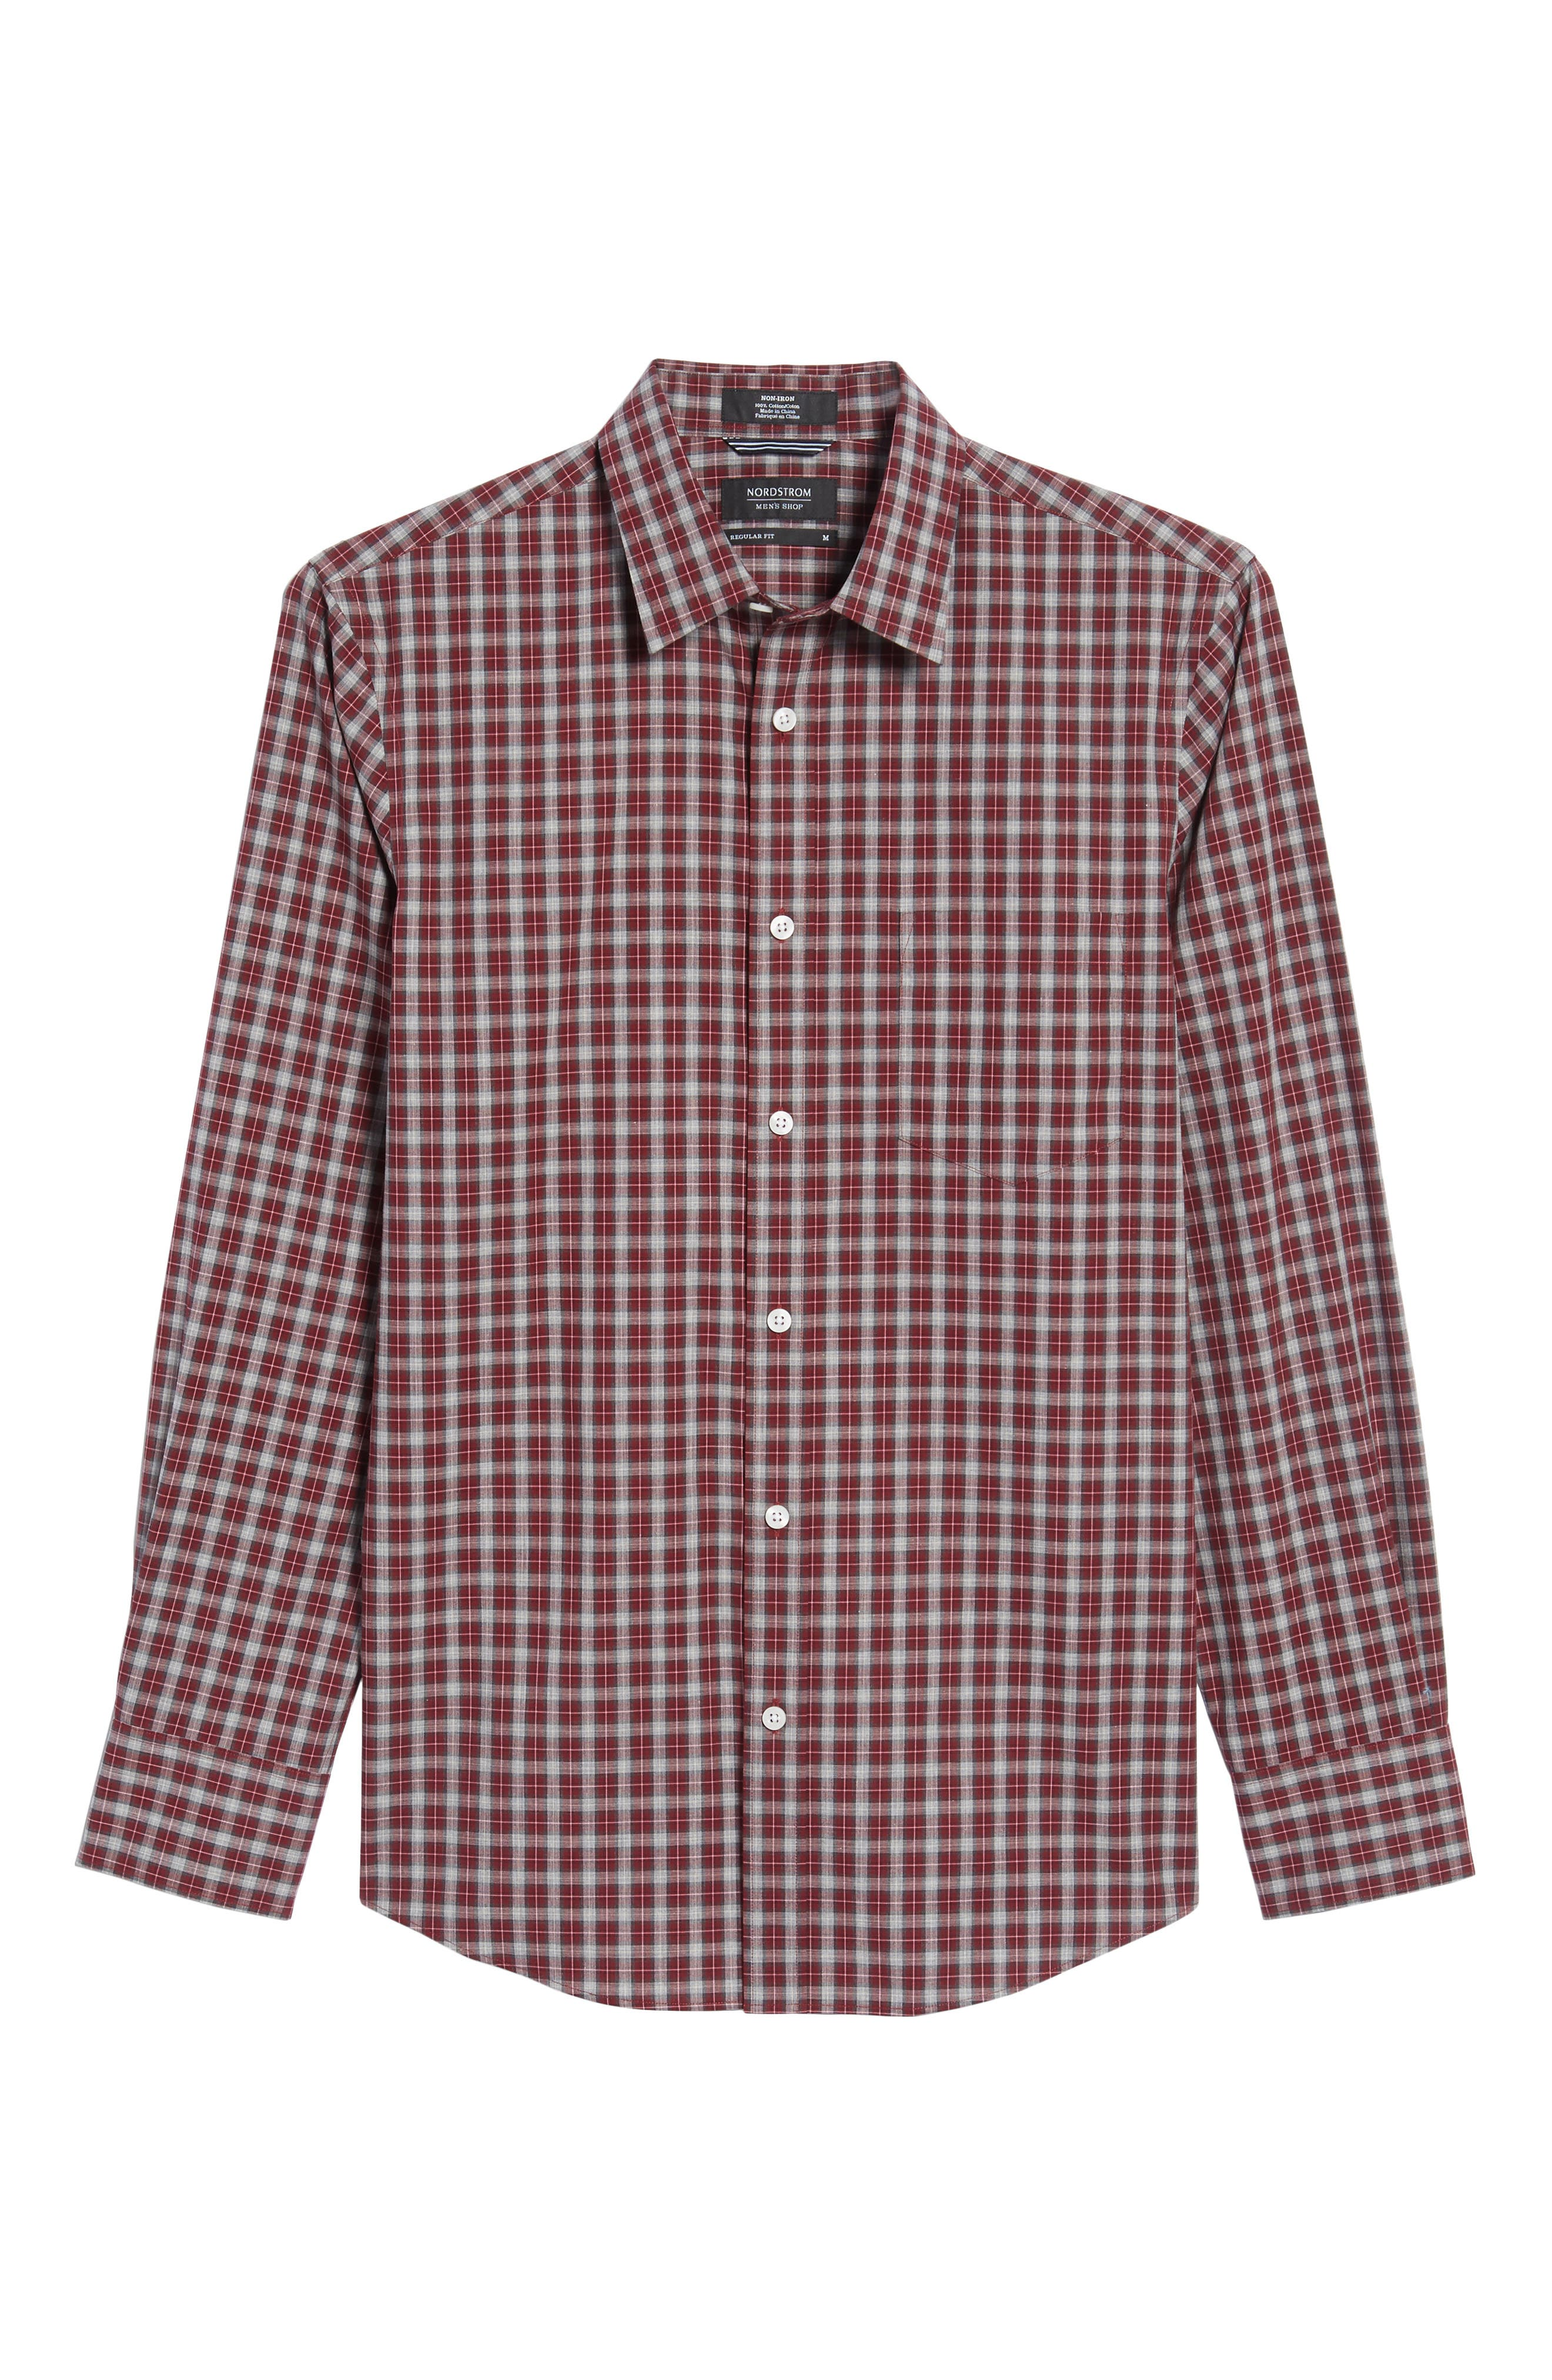 Regular Fit Non-Iron Check Sport Shirt,                             Alternate thumbnail 6, color,                             610